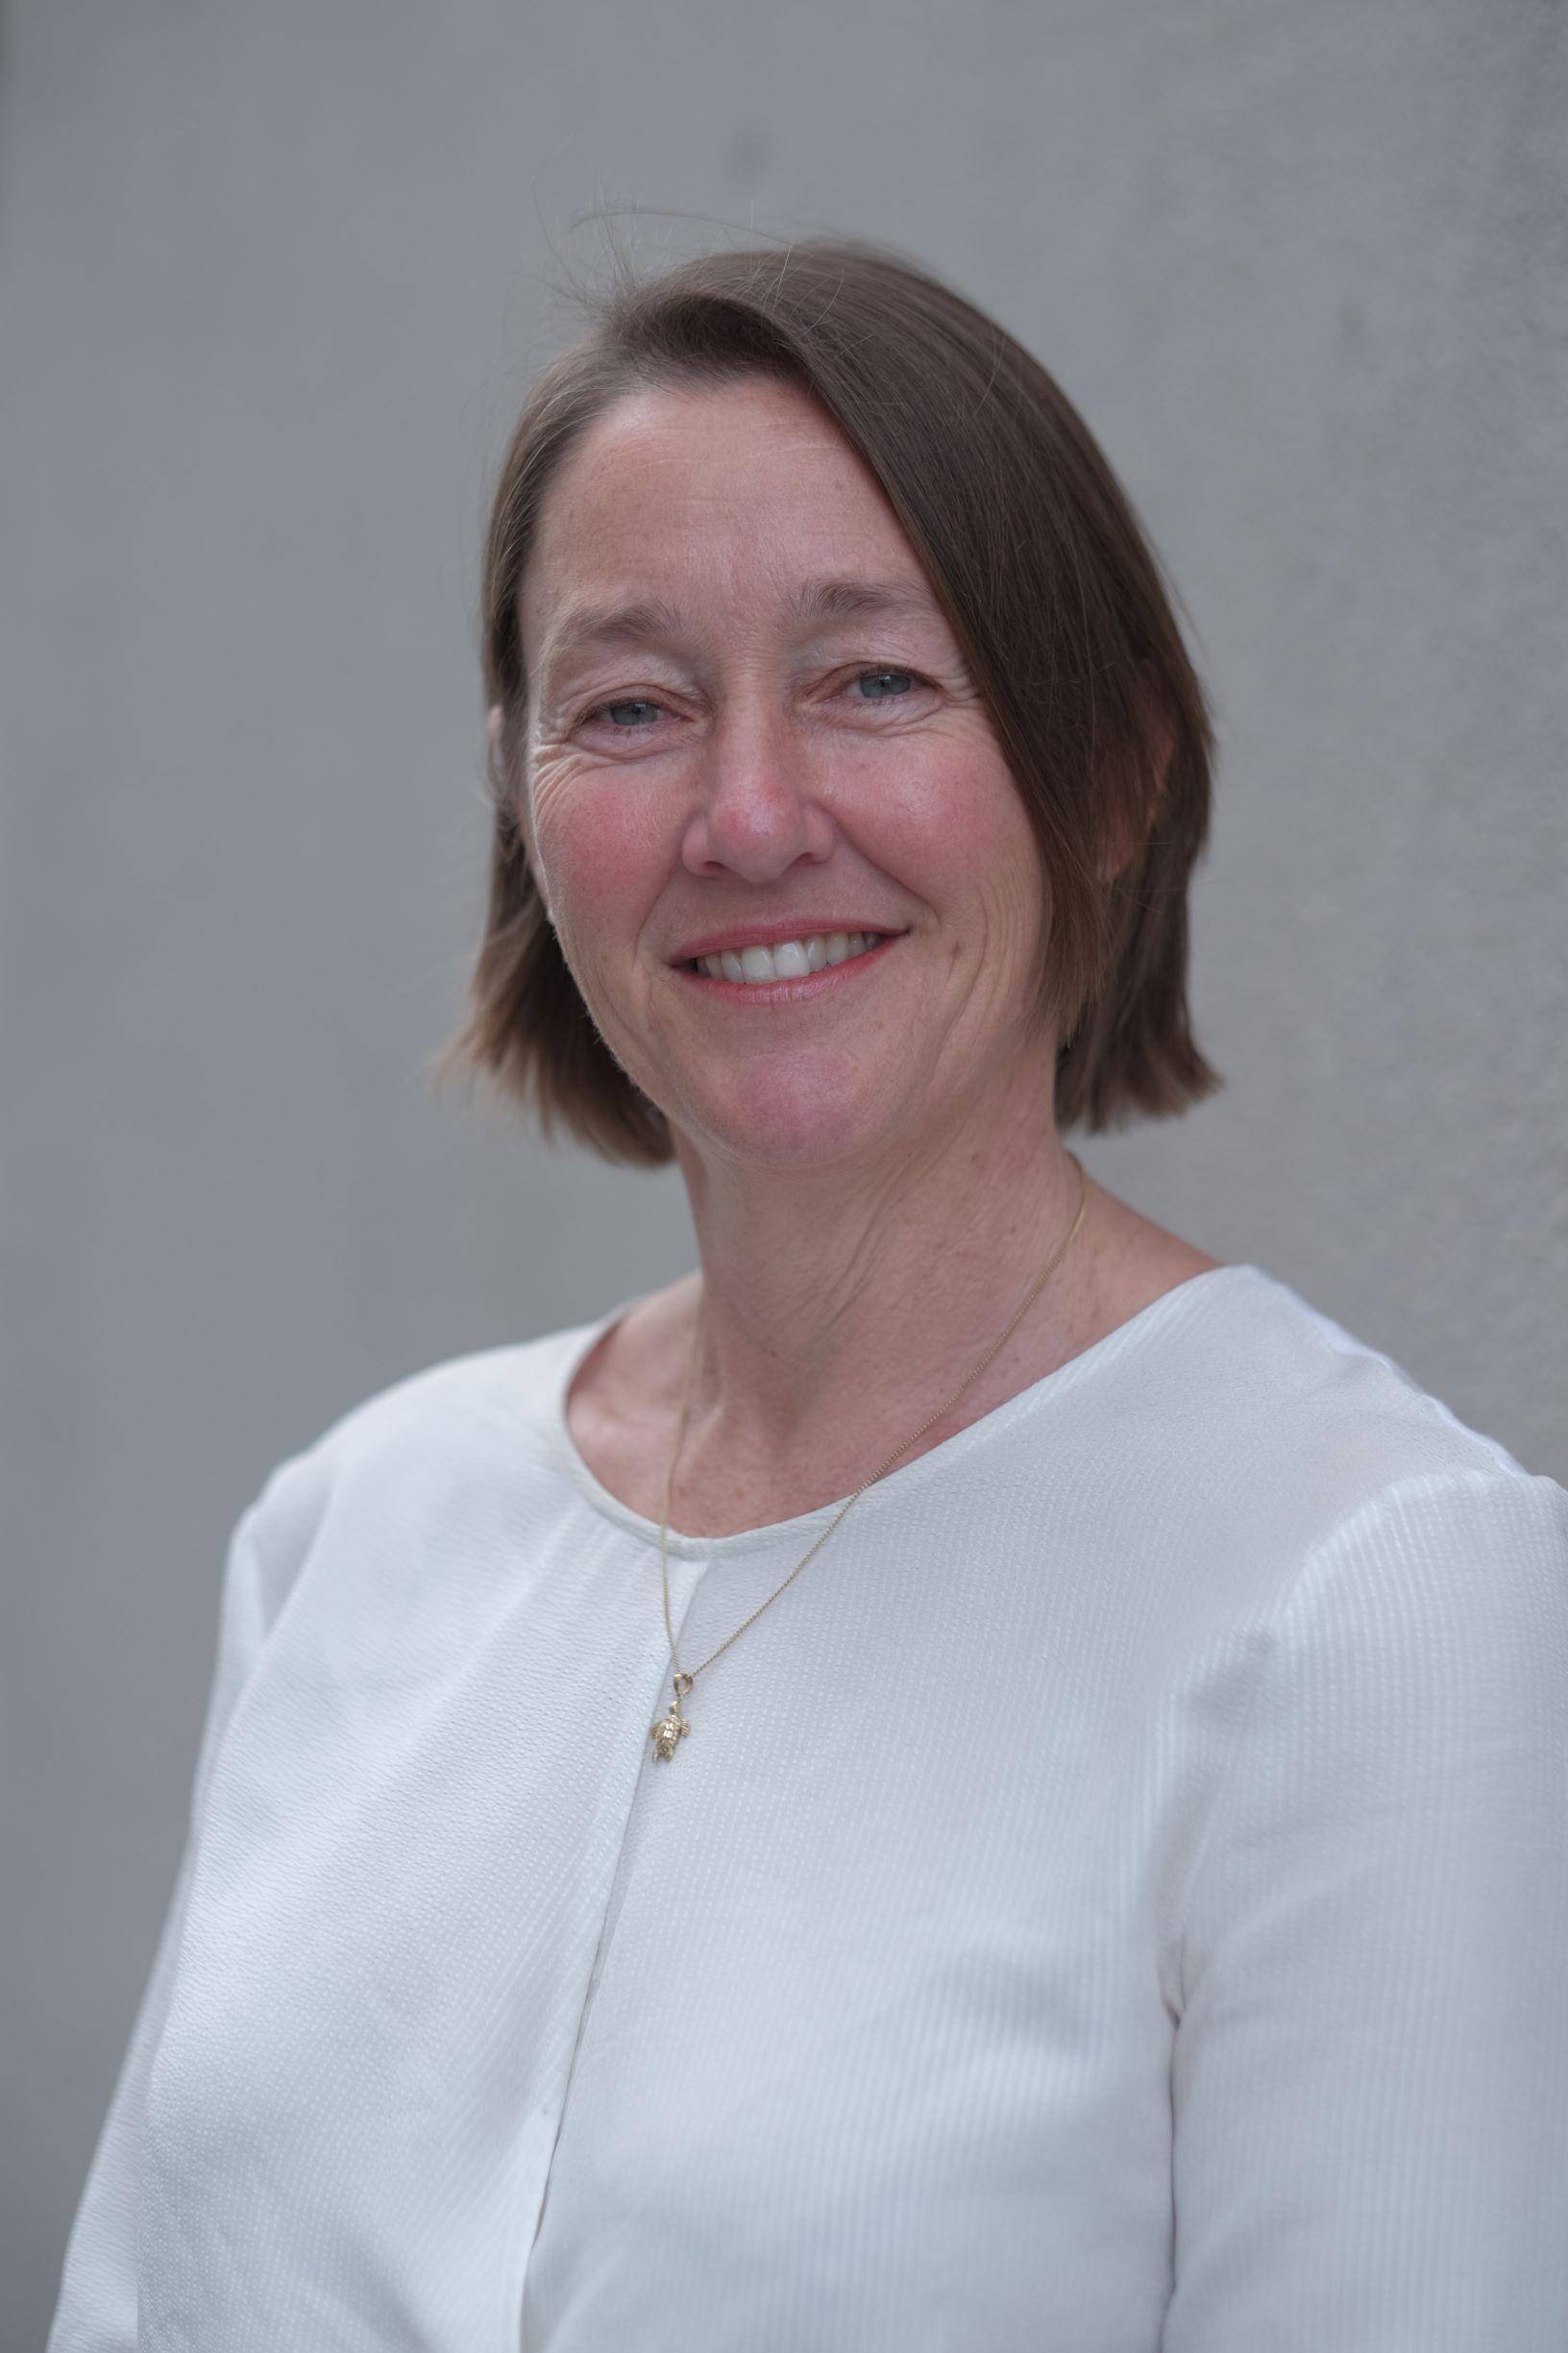 Dr Genevieve Knight